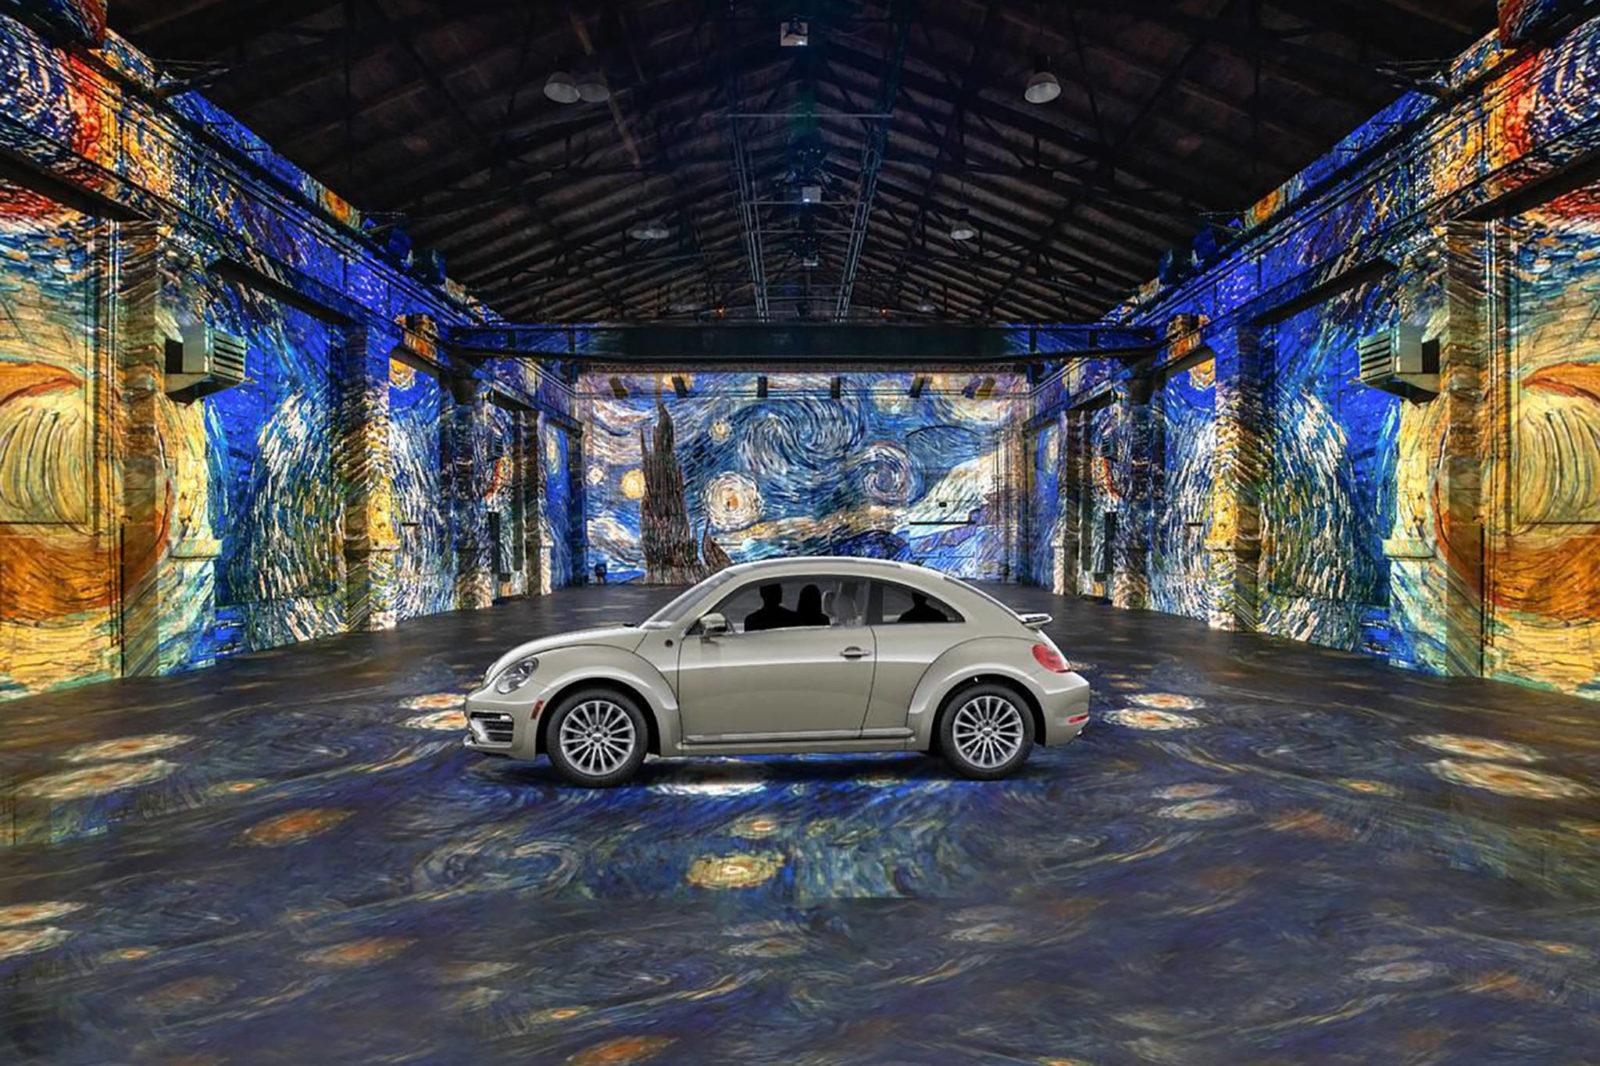 van gogh by car immersive experiences